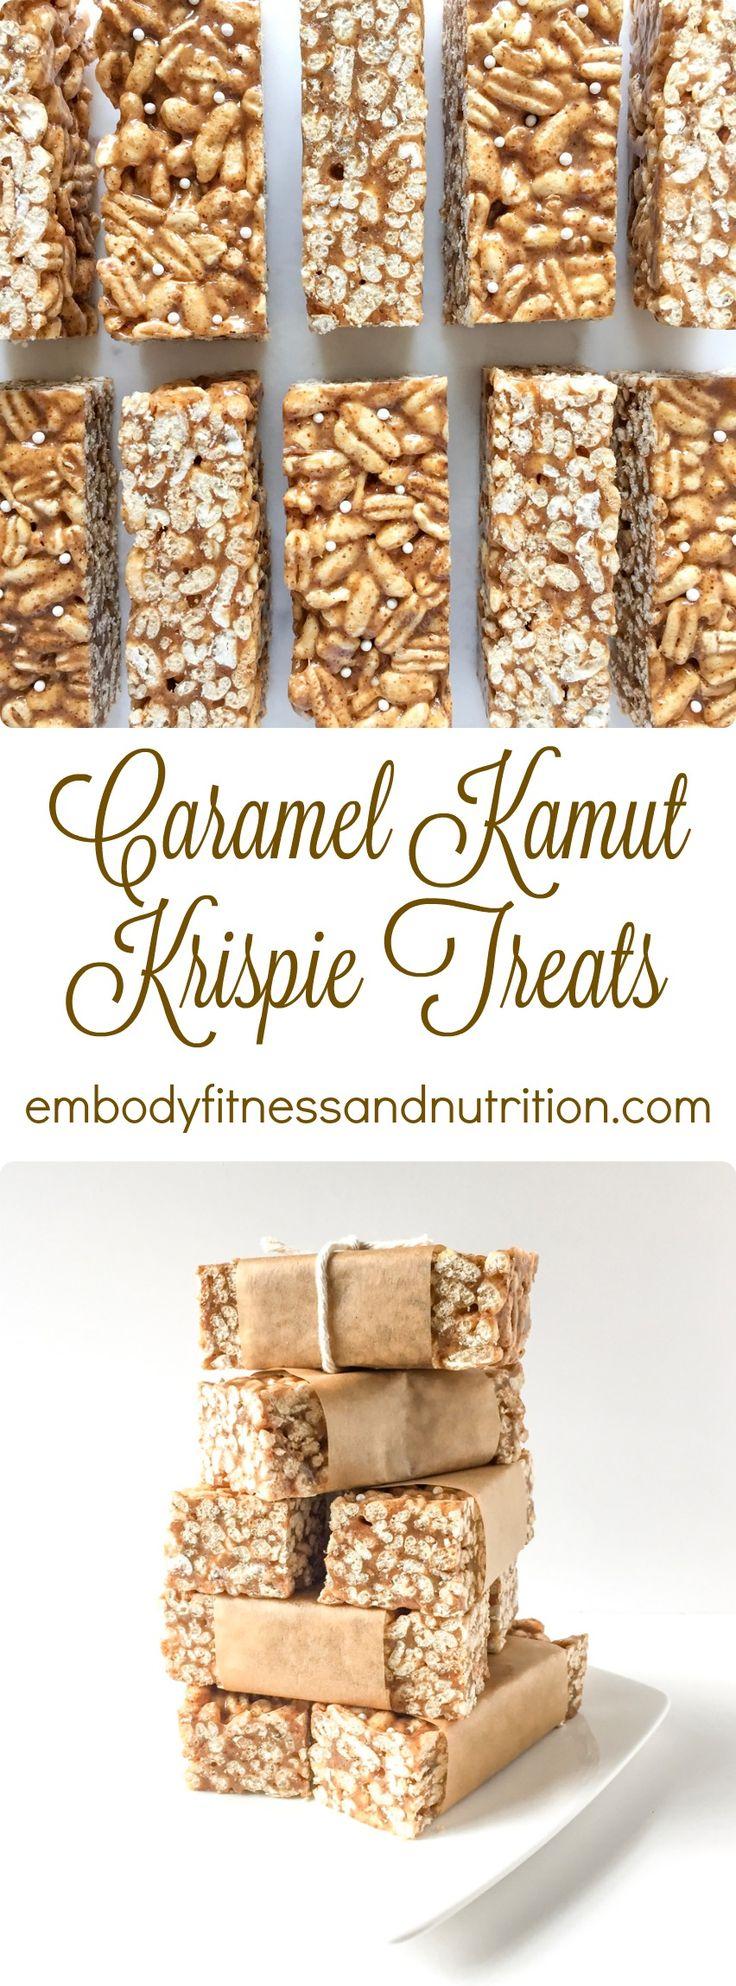 Caramel Kamut Krispie Treats ~ I'll use 3/4C Agave instead of rice syrup